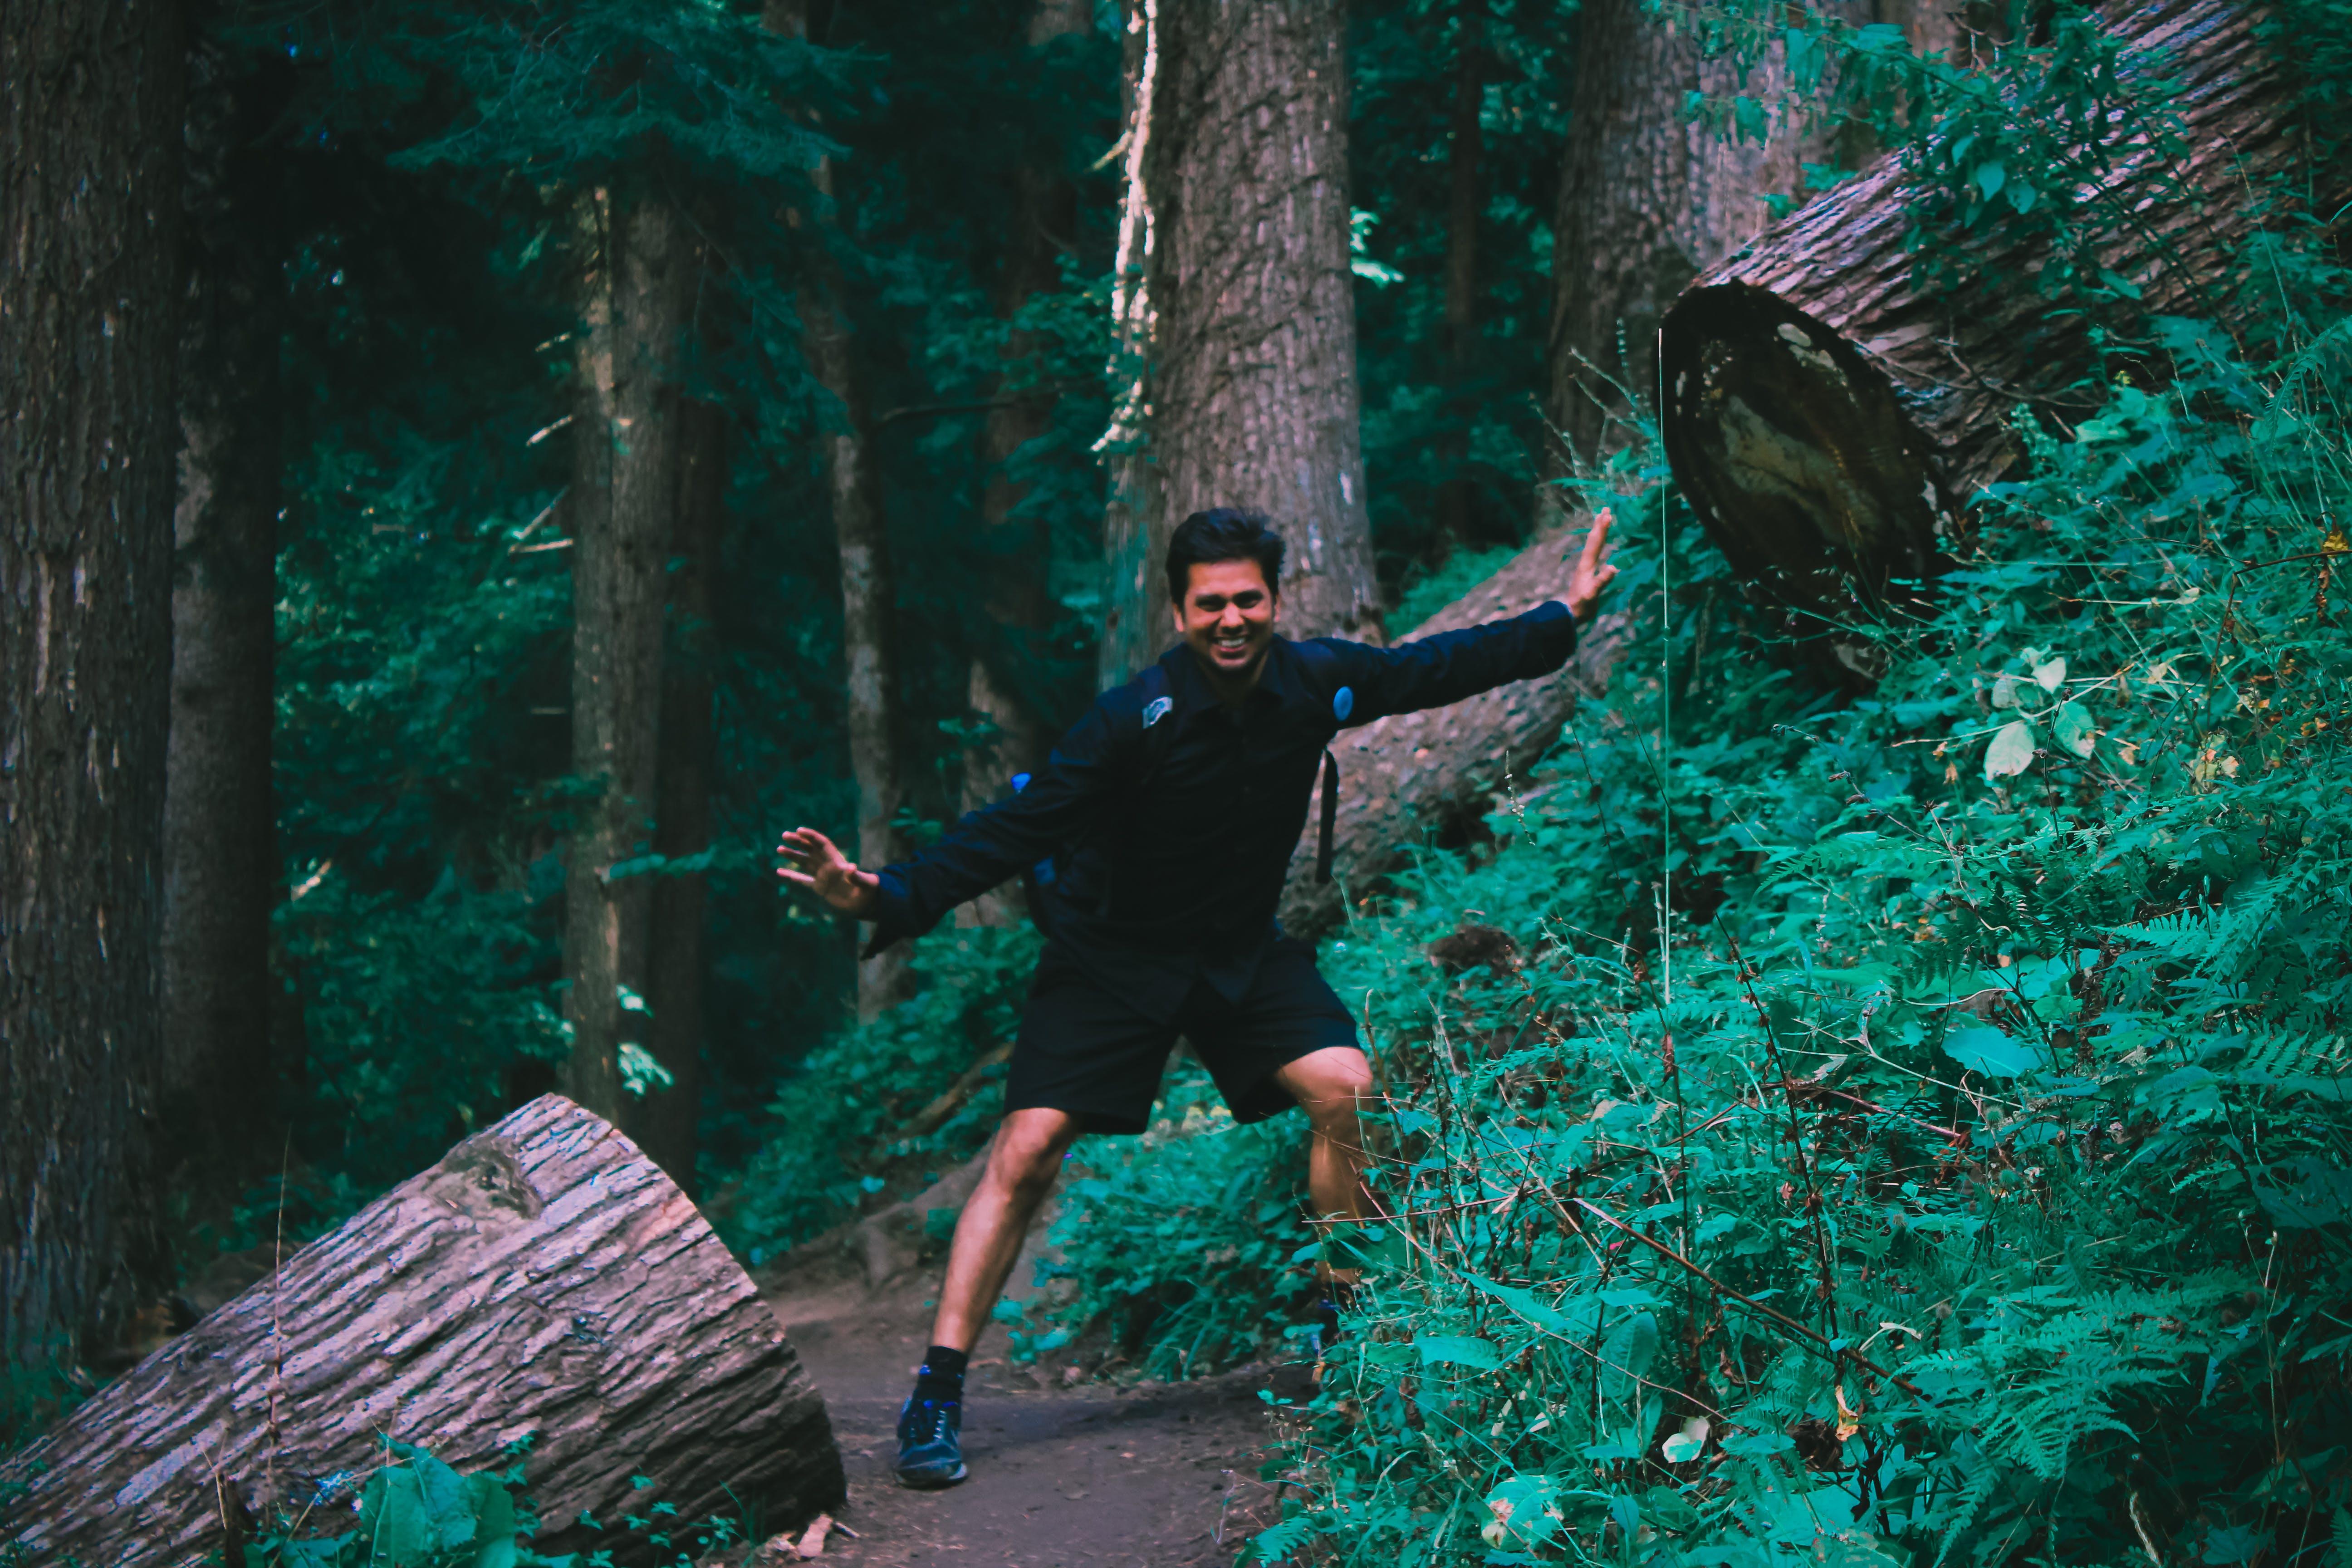 zu ausflug, bäume, berg, dunkel